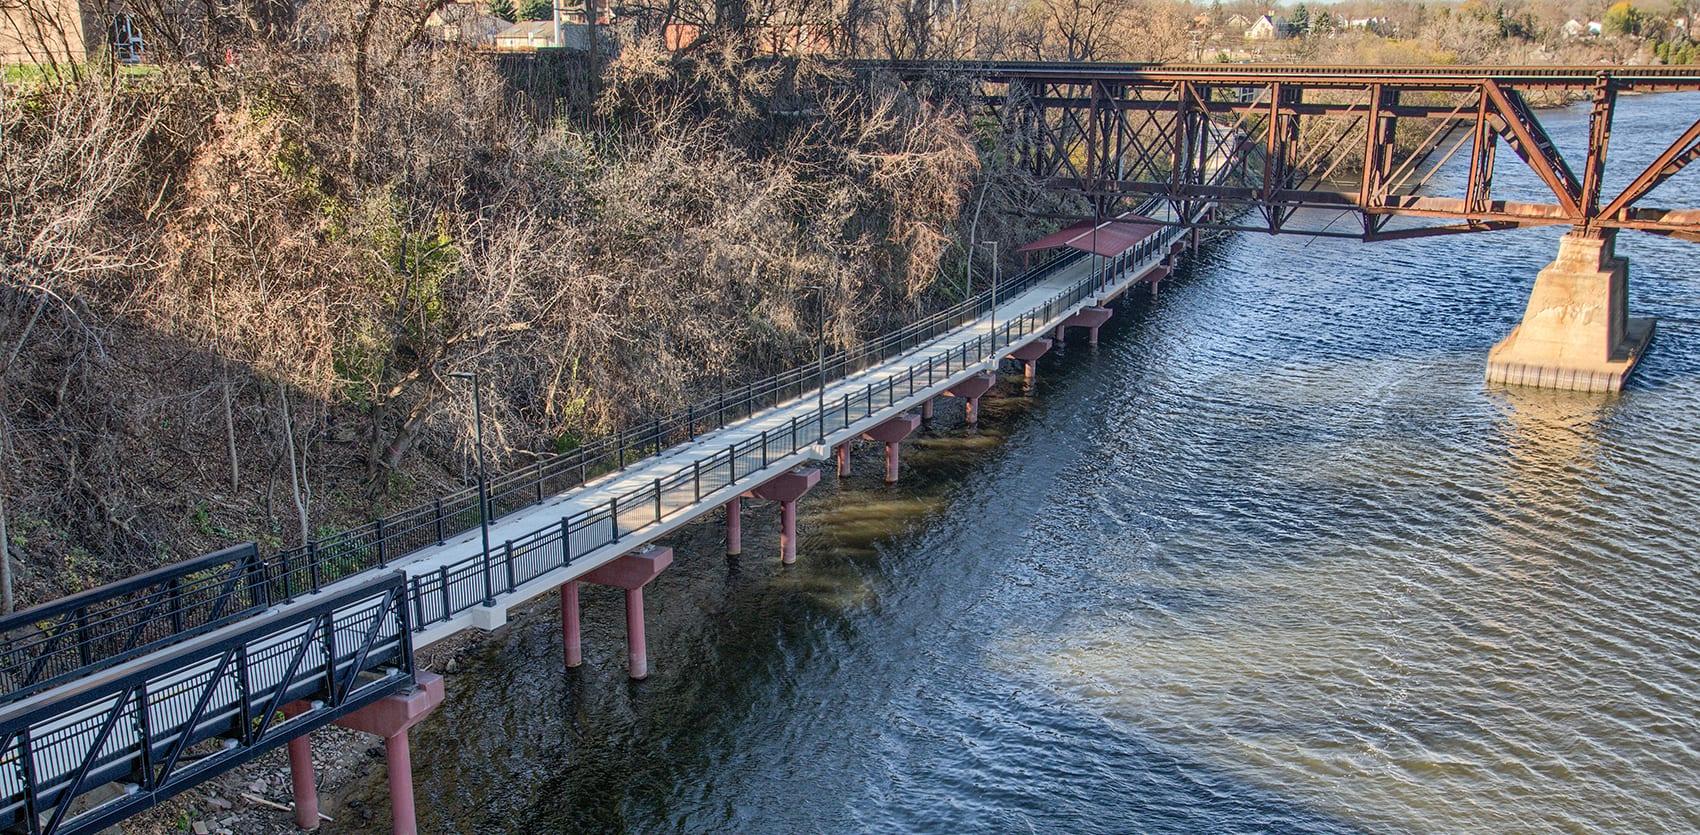 Beaver Island Bike Path and Pedestrian Bridge